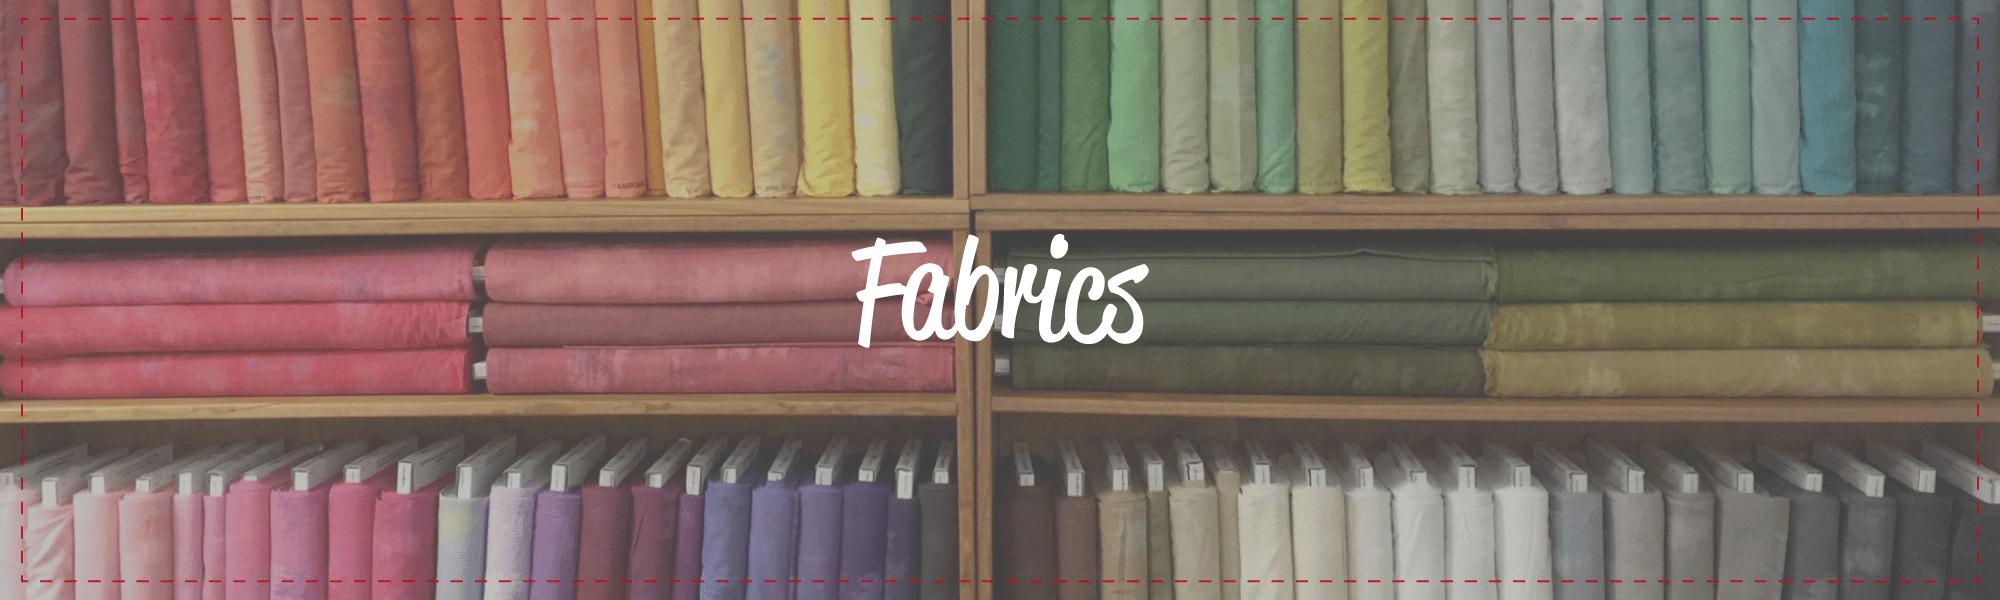 Mangelsen's Fabrics